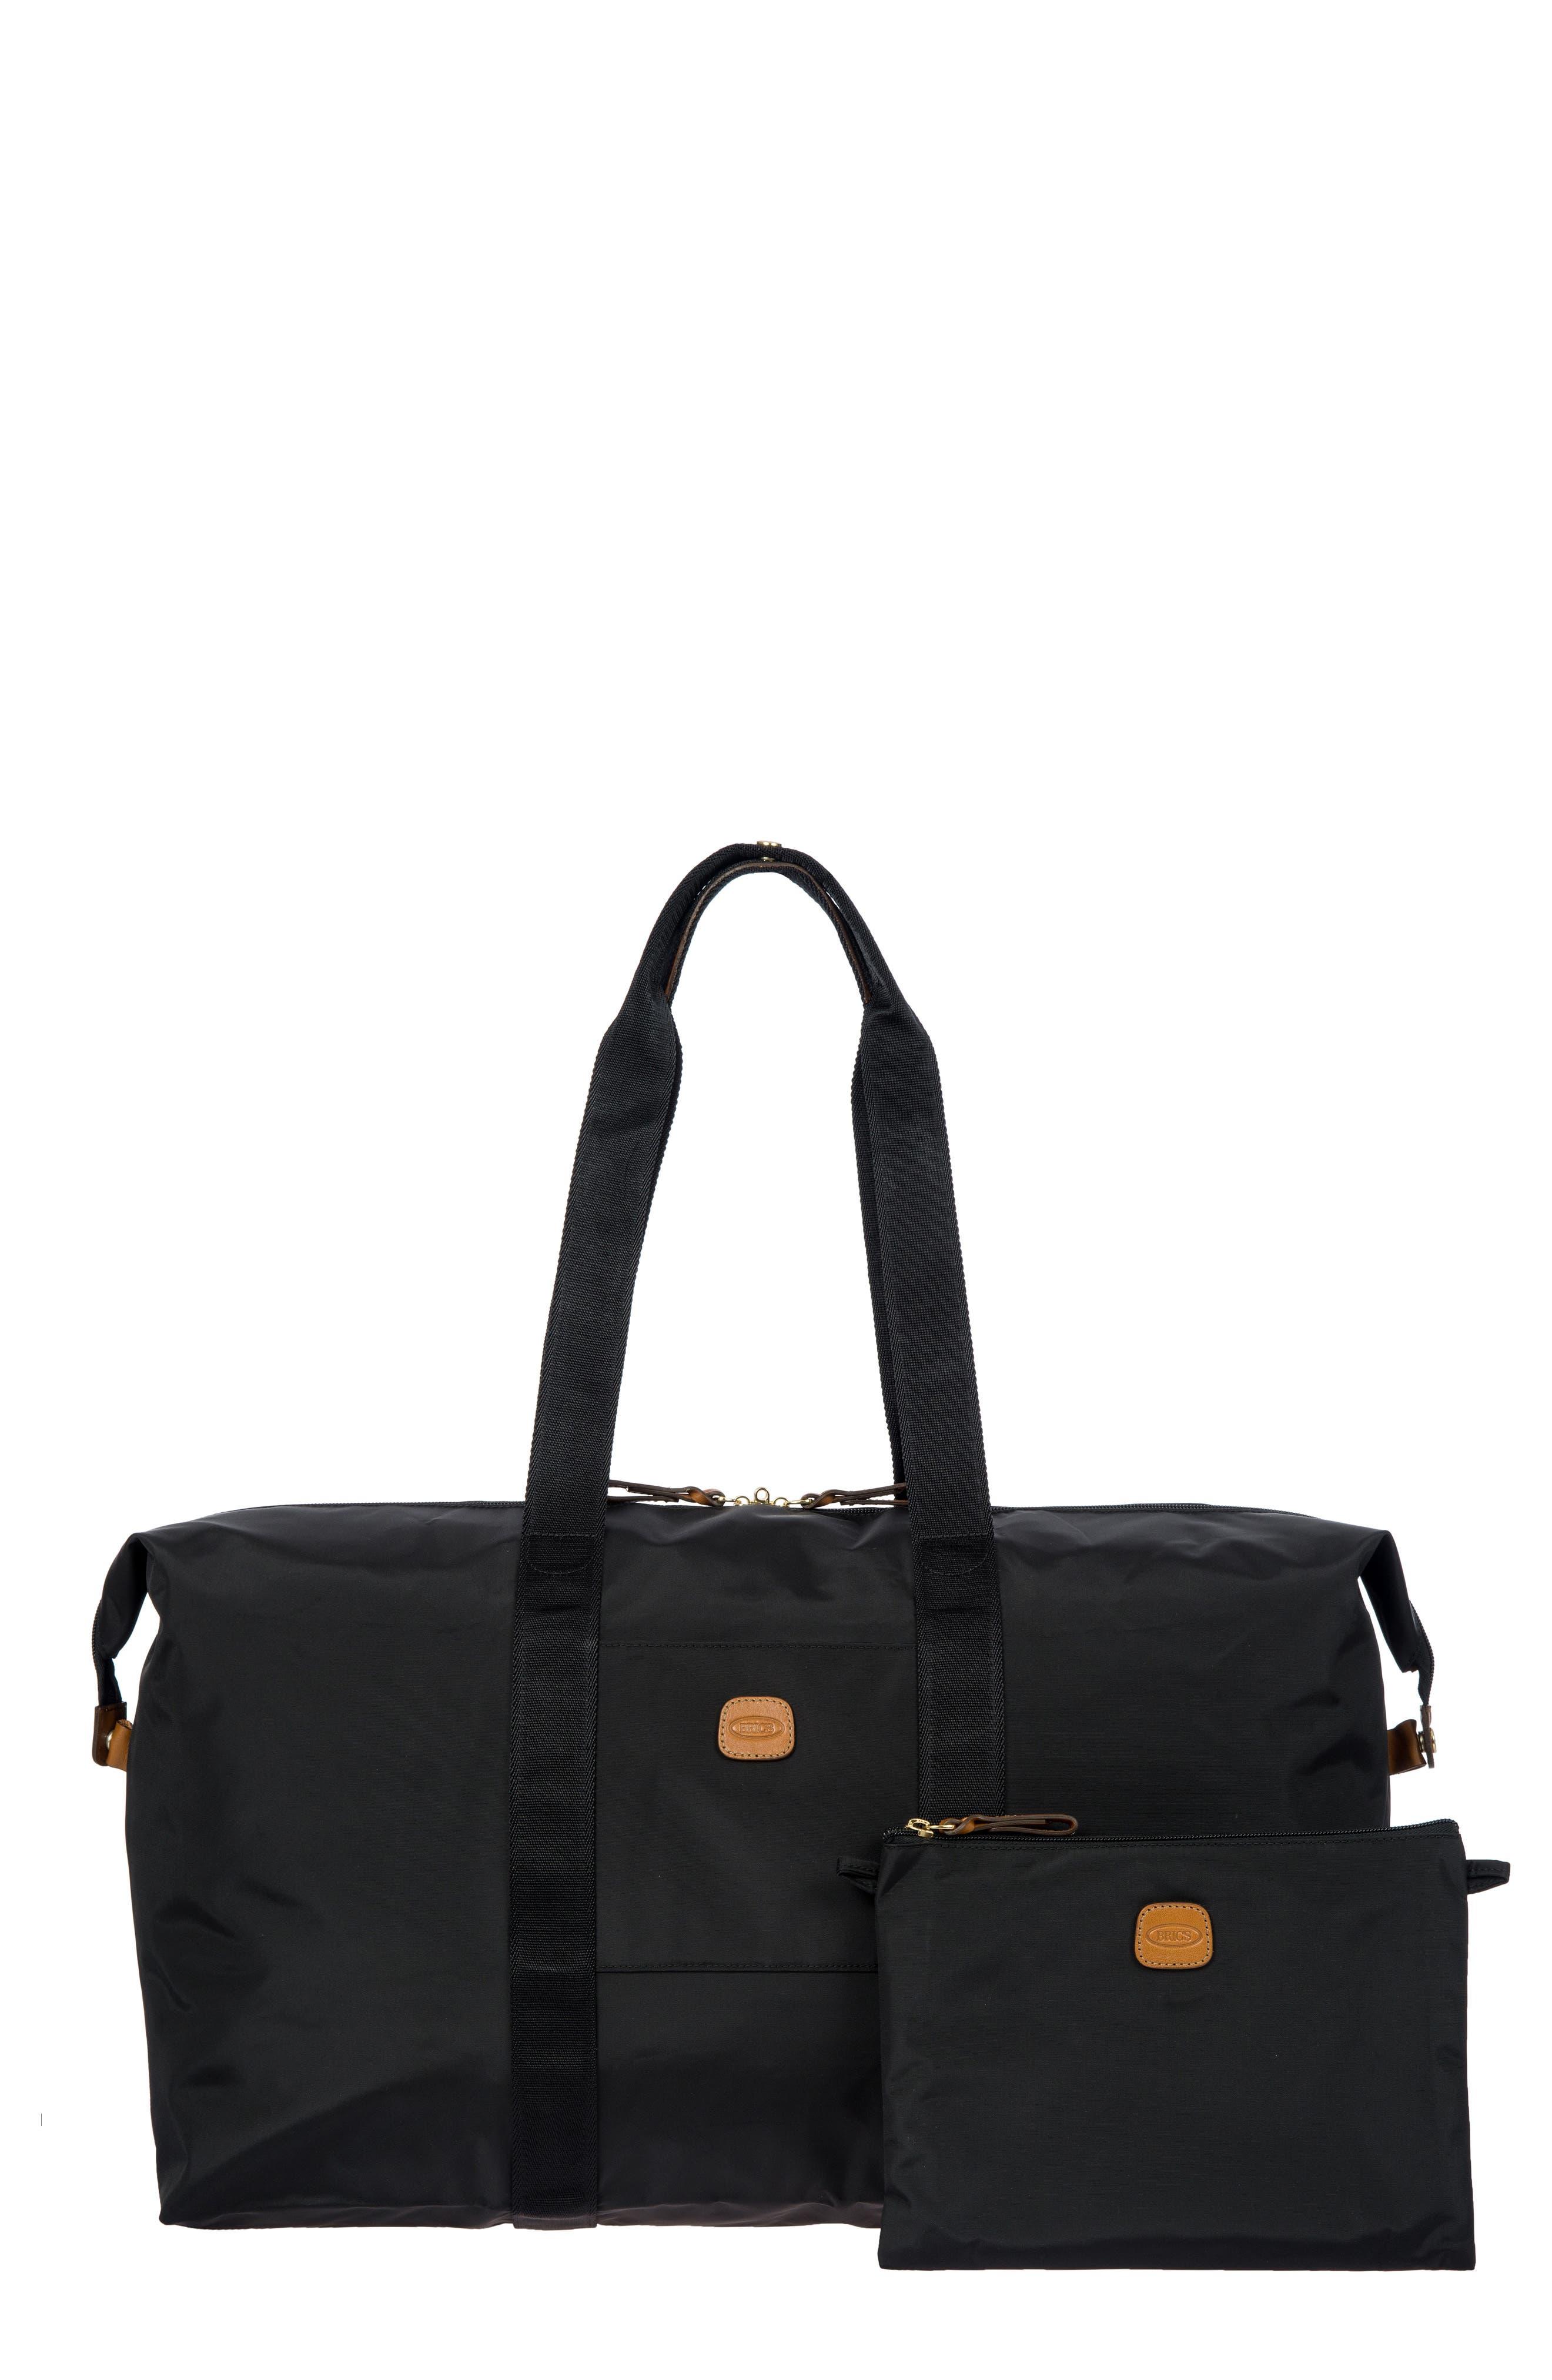 X-Bag 22-Inch Folding Duffel Bag,                             Main thumbnail 1, color,                             BLACK